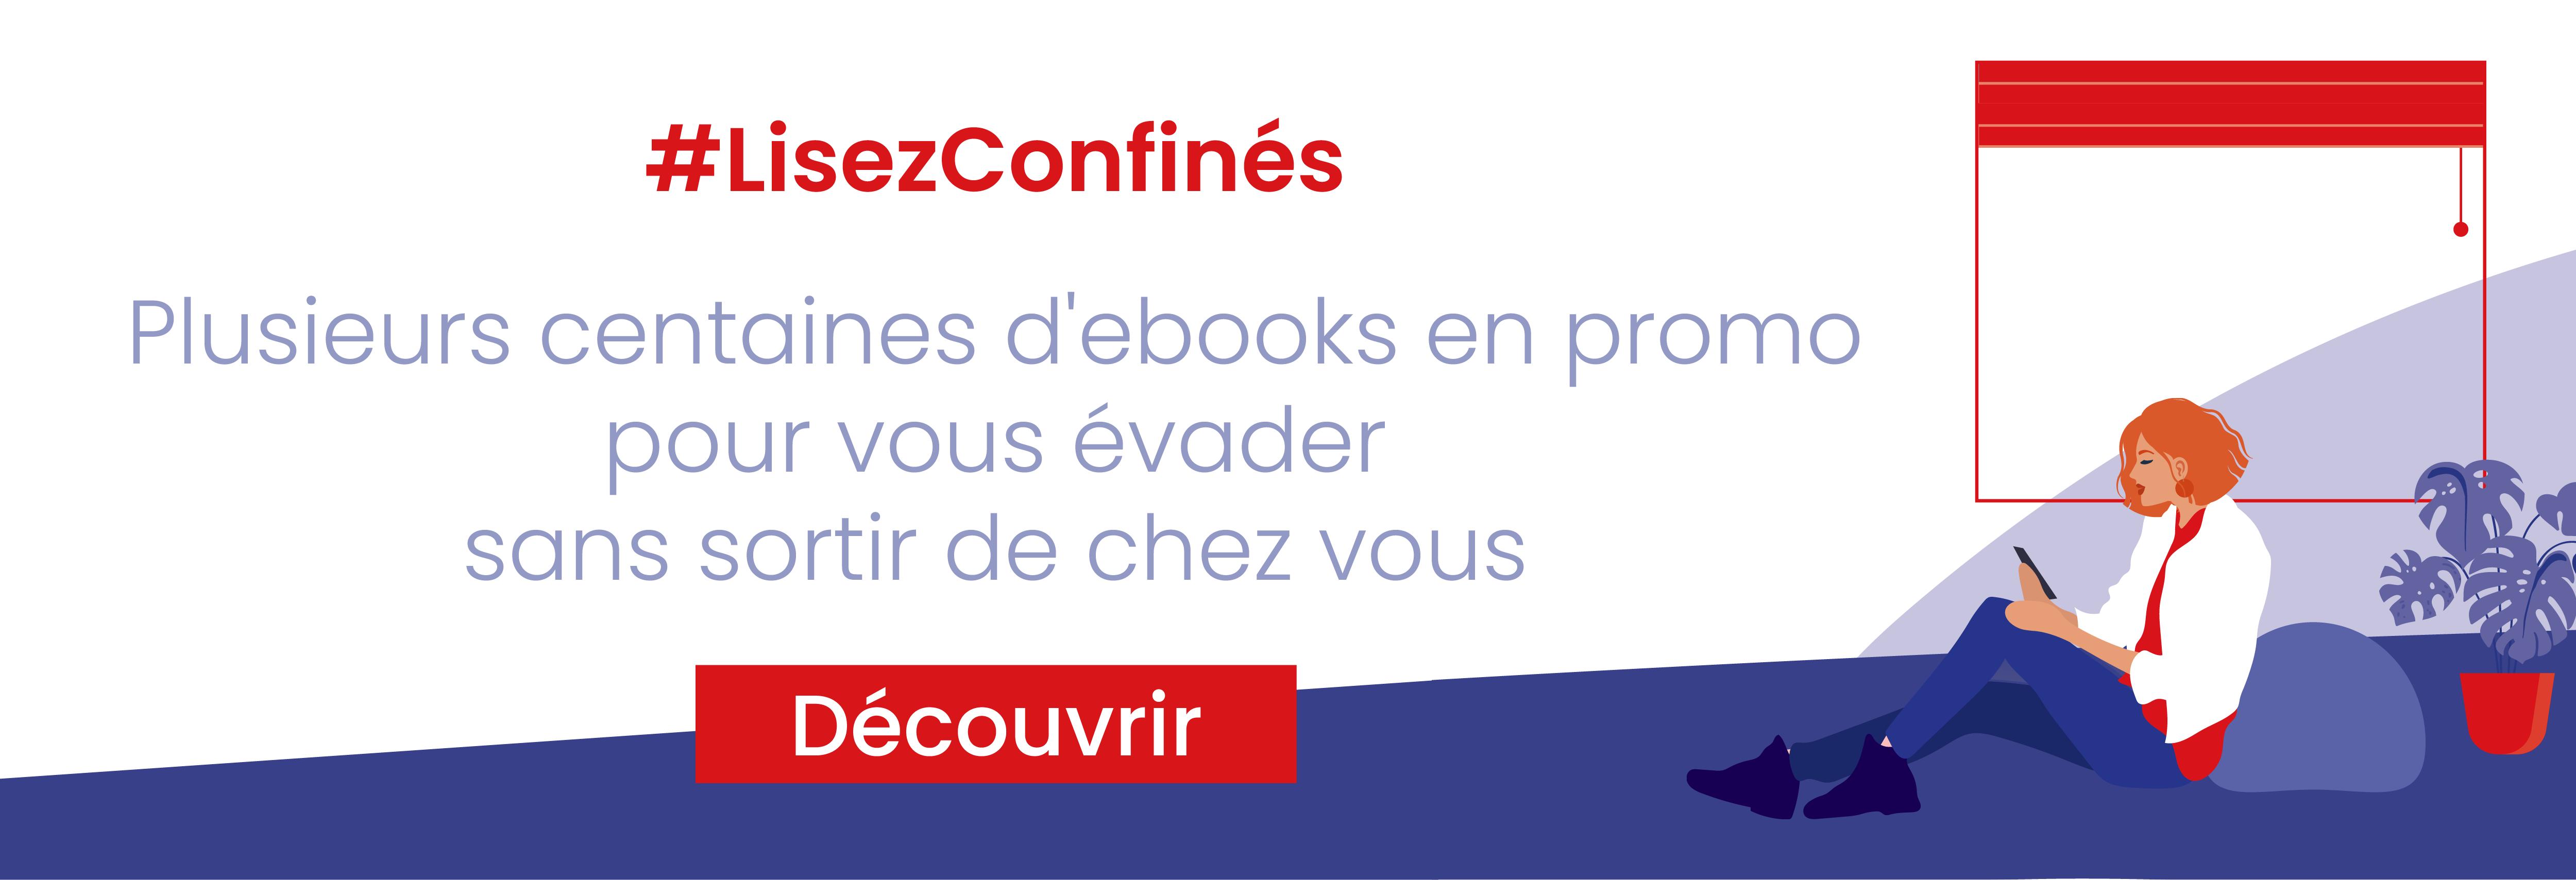 Selection #LisezConfines